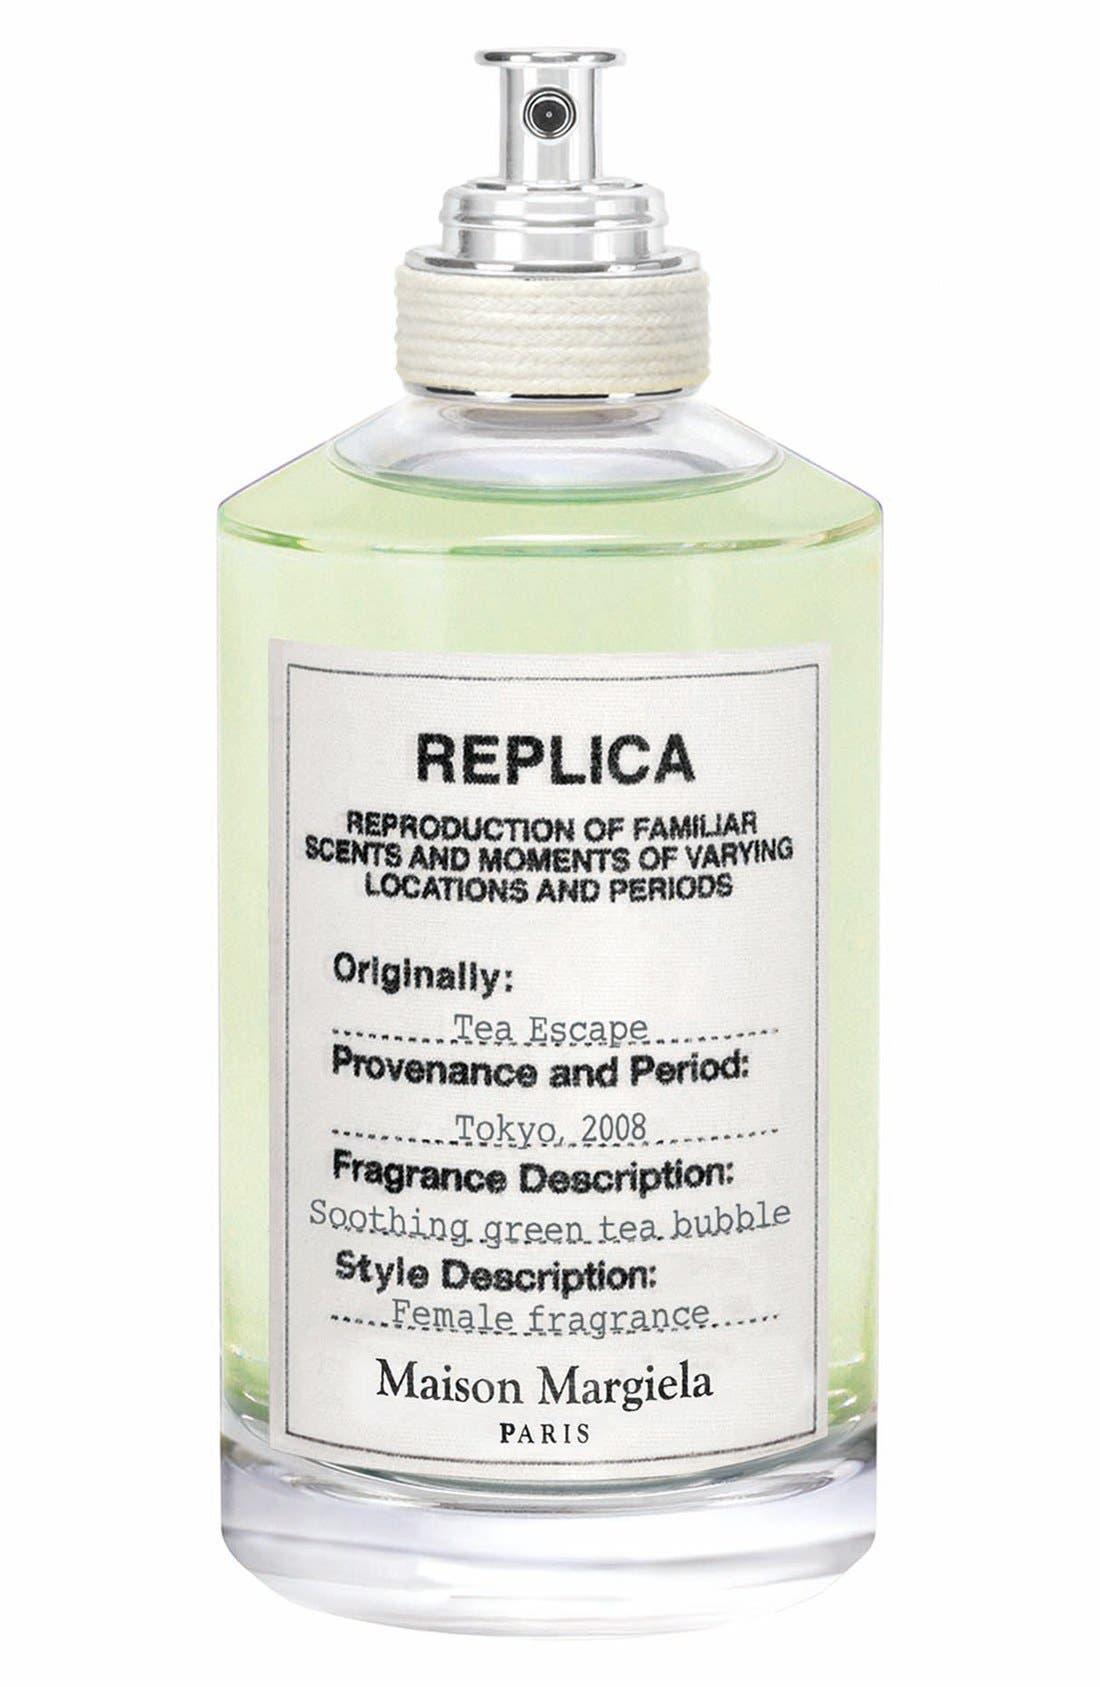 Maison Margiela Replica Tea Escape Fragrance